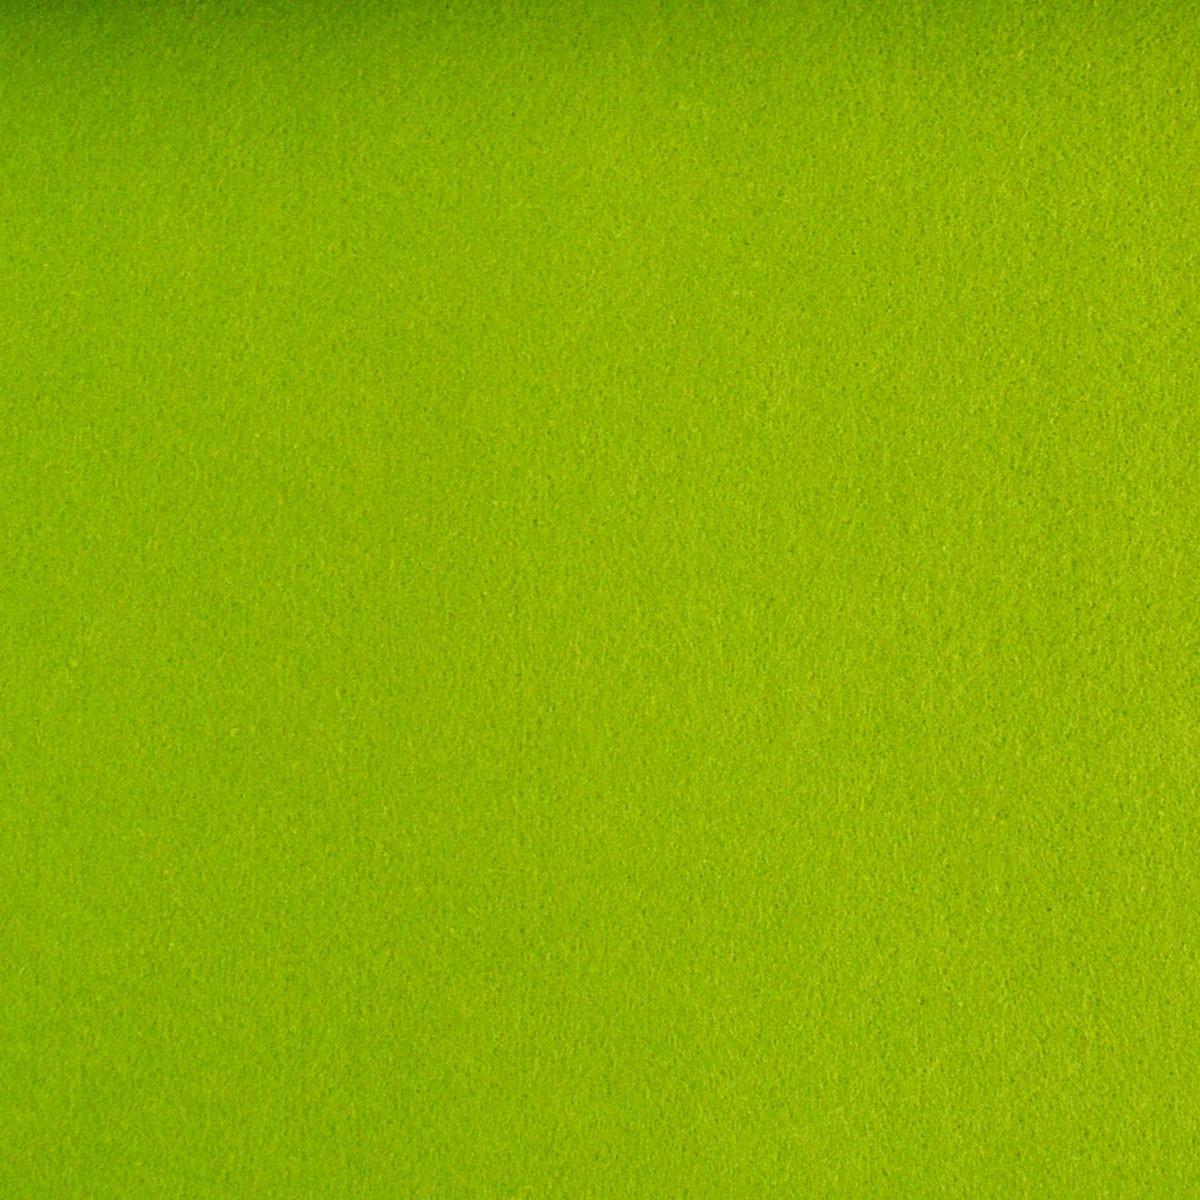 Kreativstoff Bastelfilz einfarbig moosgrün 45cm Breite 4mm Stärke